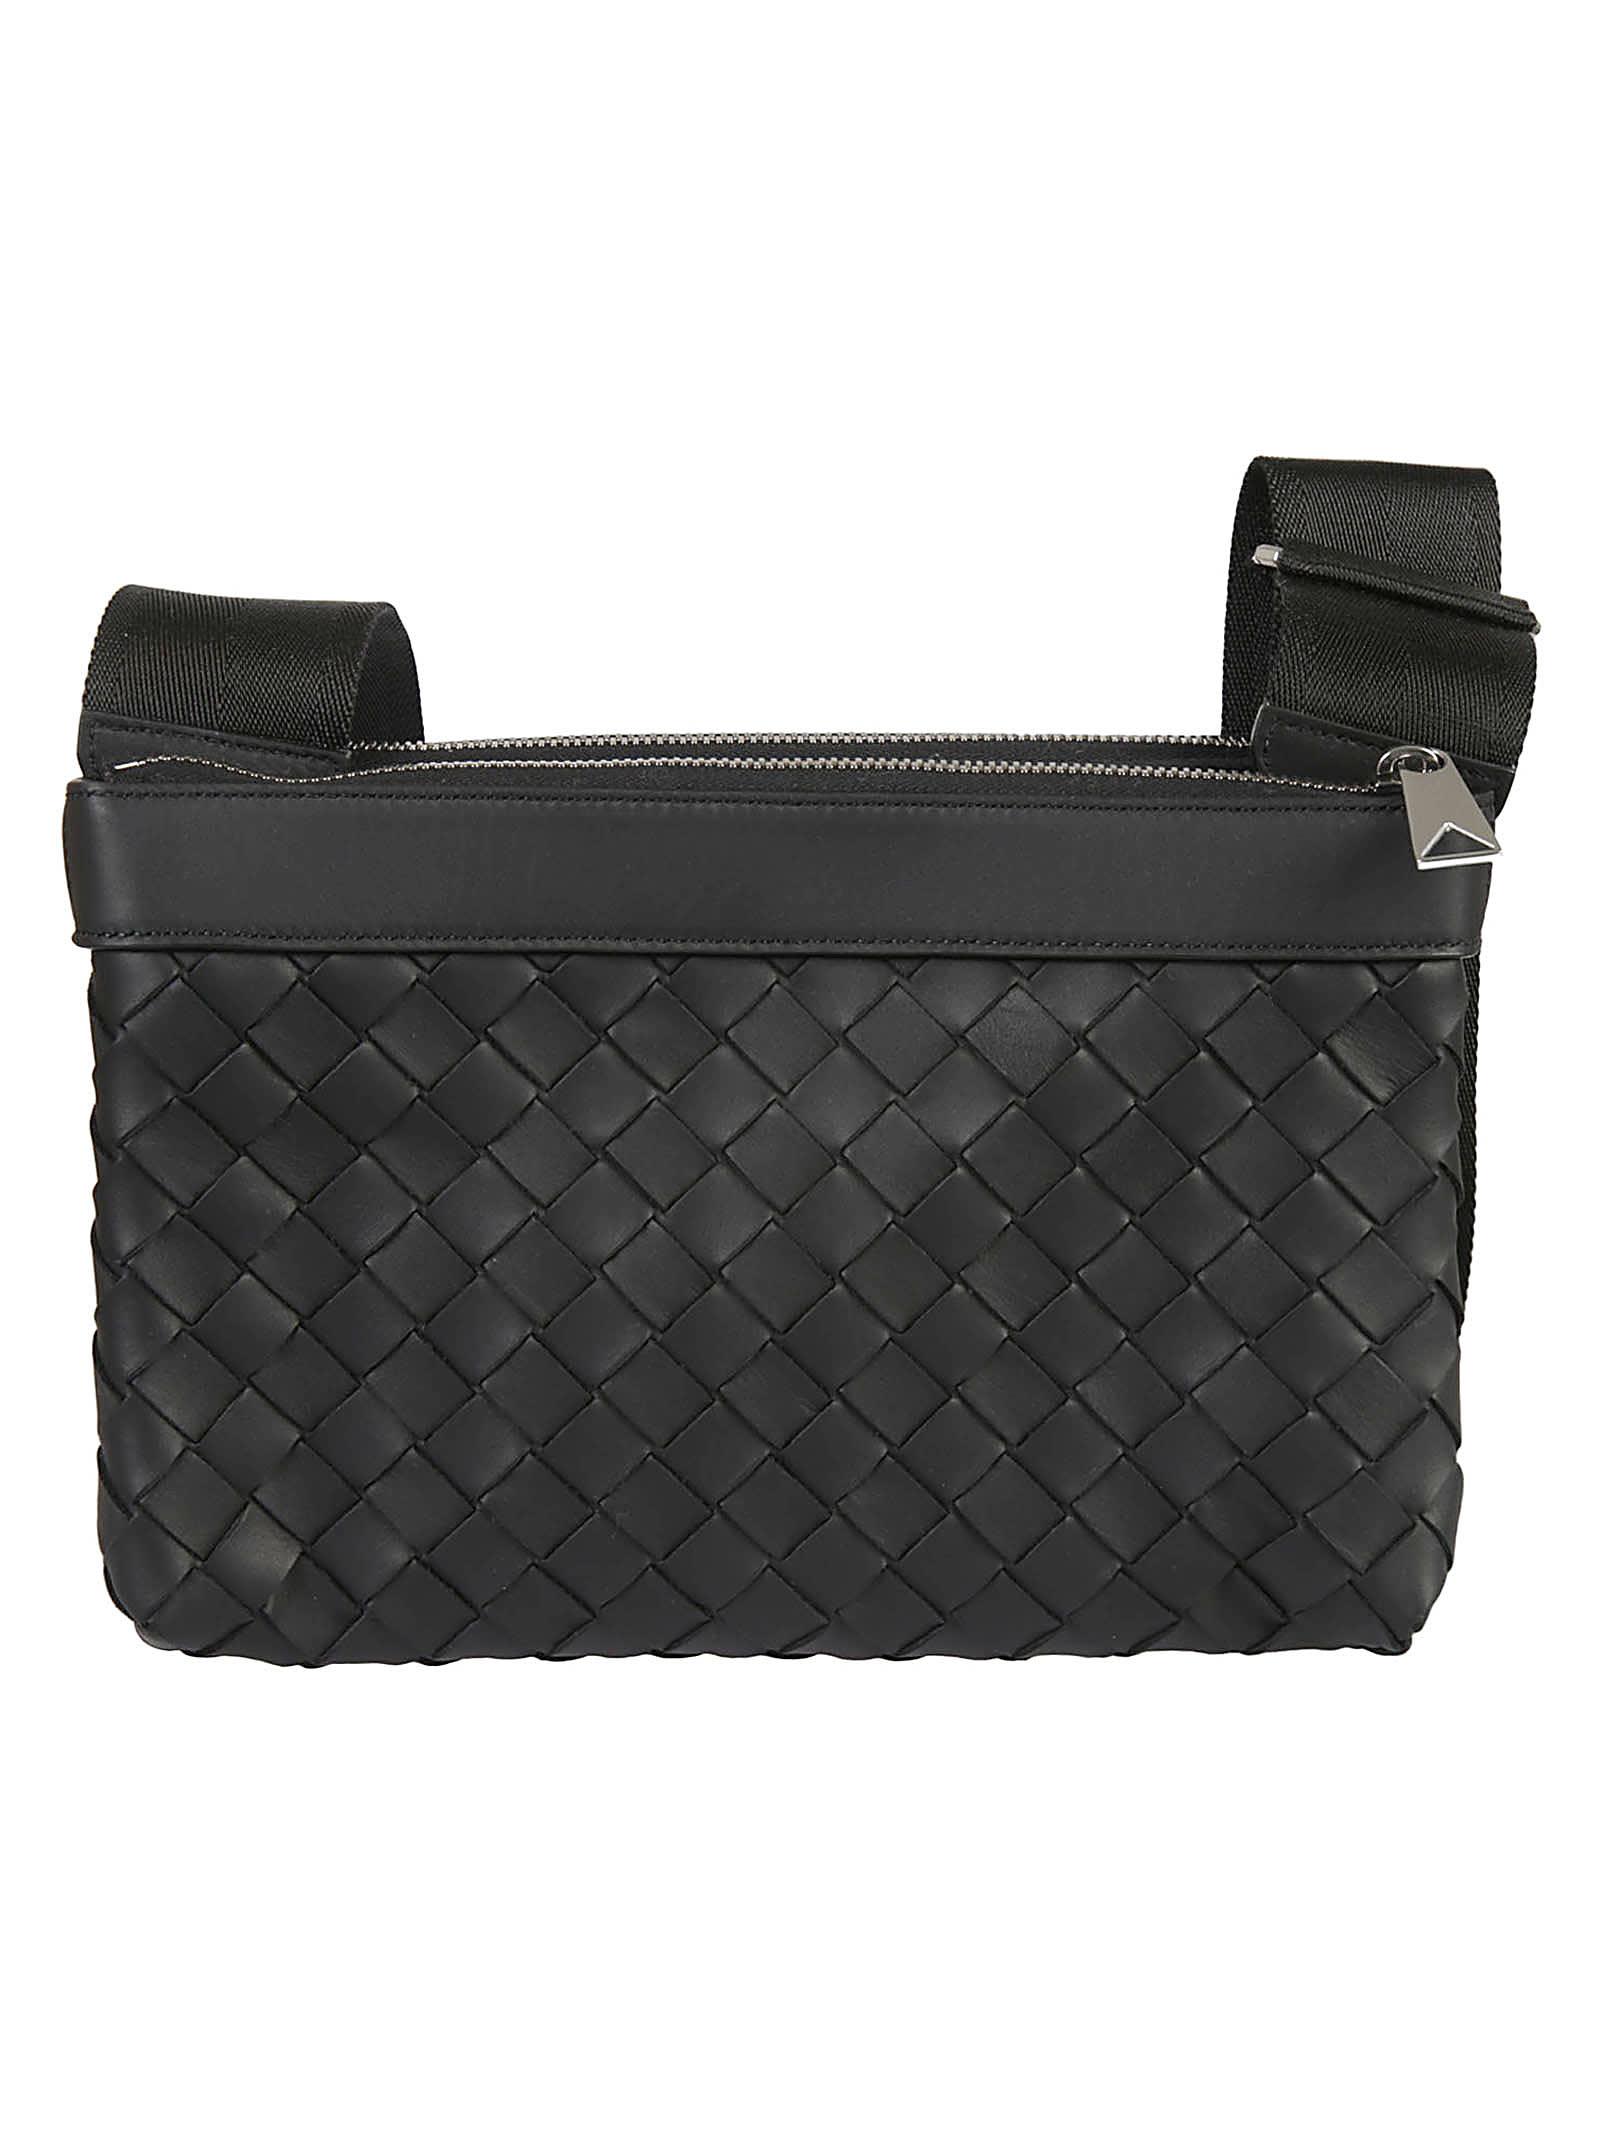 Bottega Veneta Weaved Detail Shoulder Bag